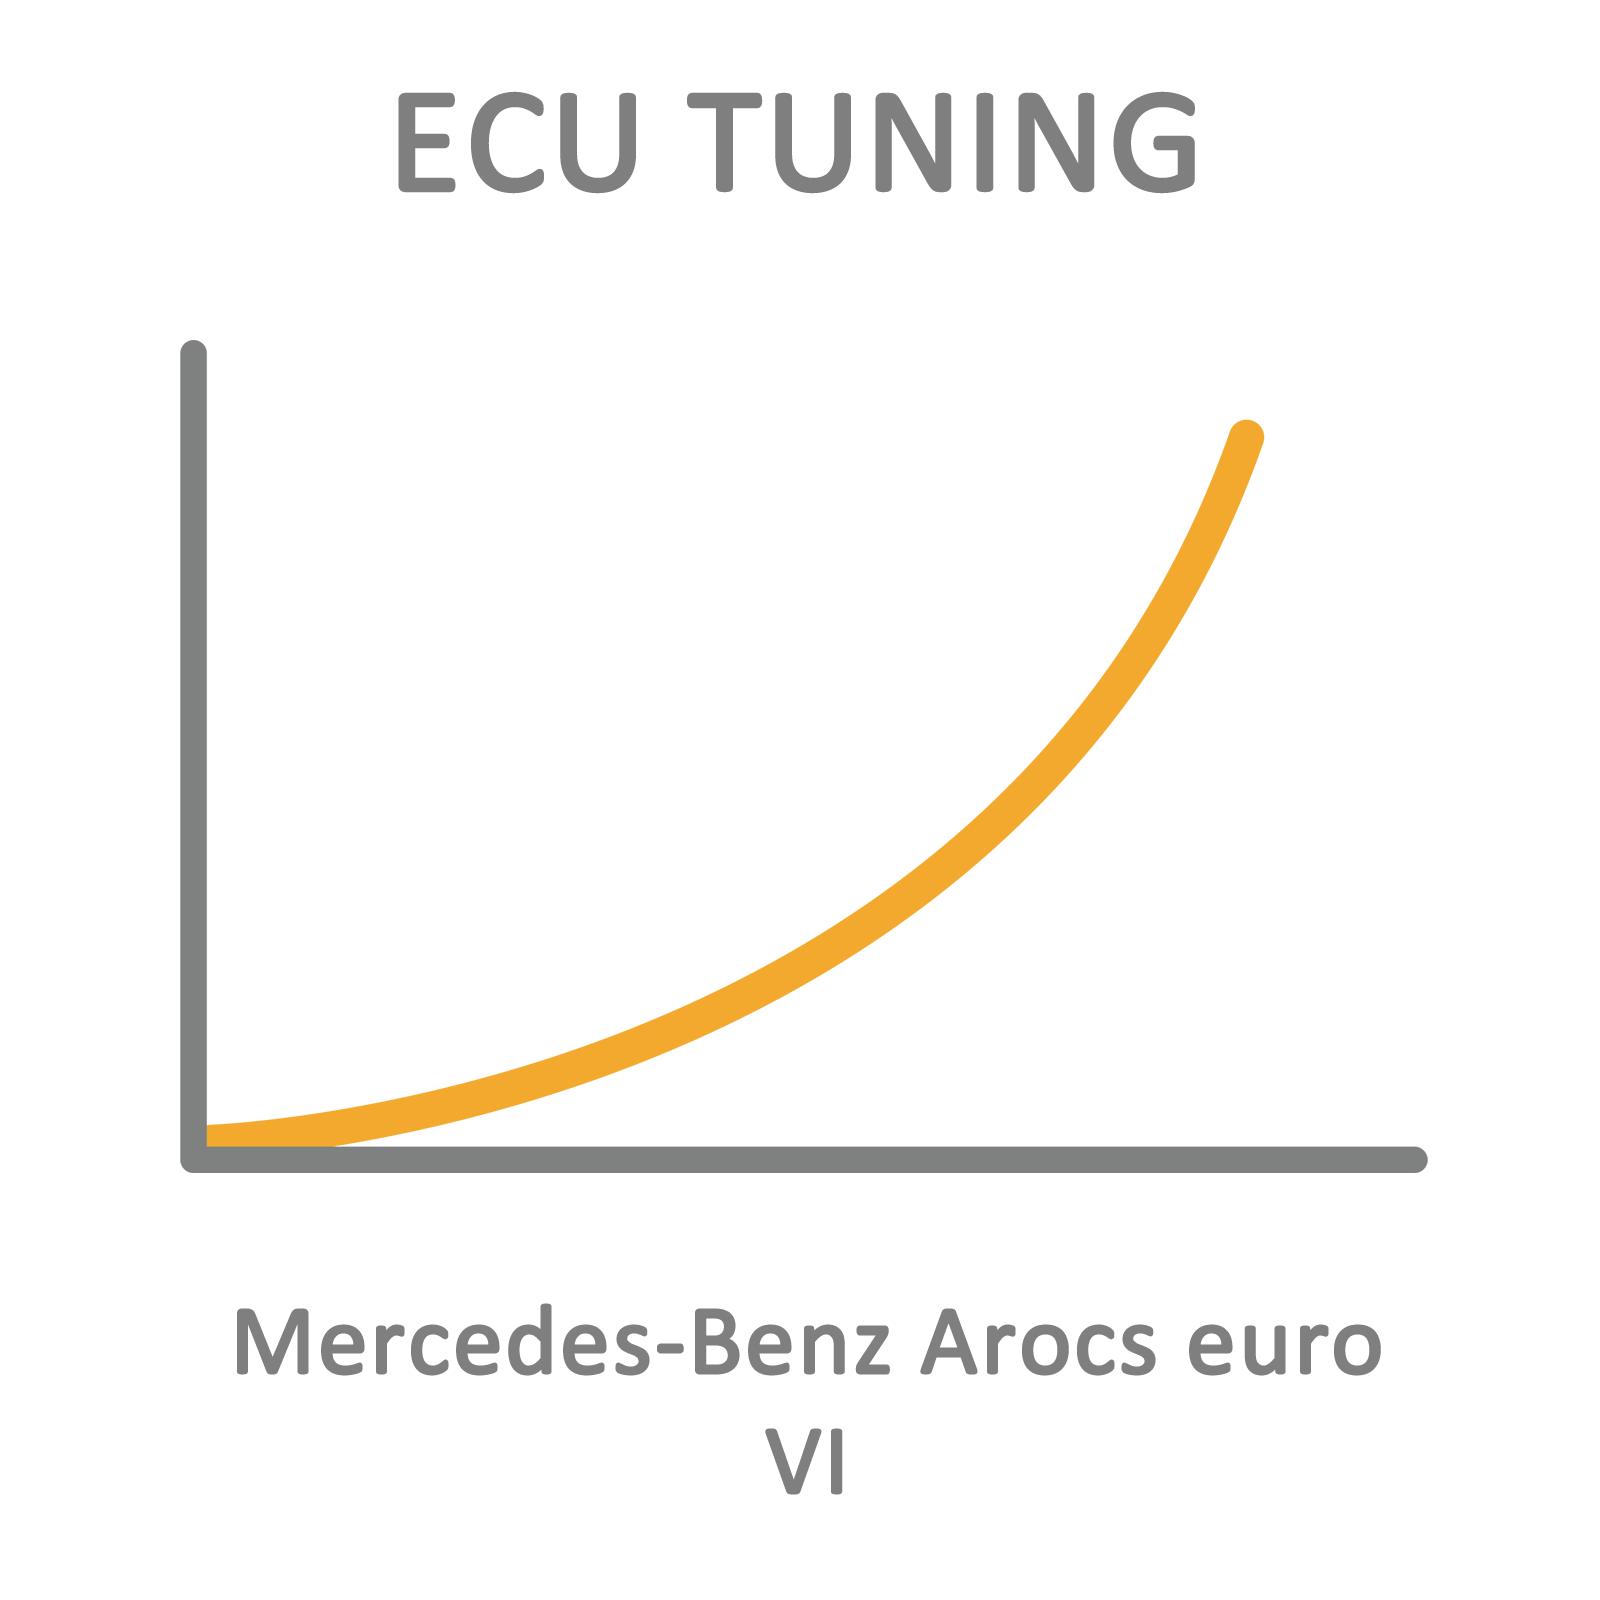 Mercedes-Benz Arocs euro VI ECU Tuning Remapping Programming